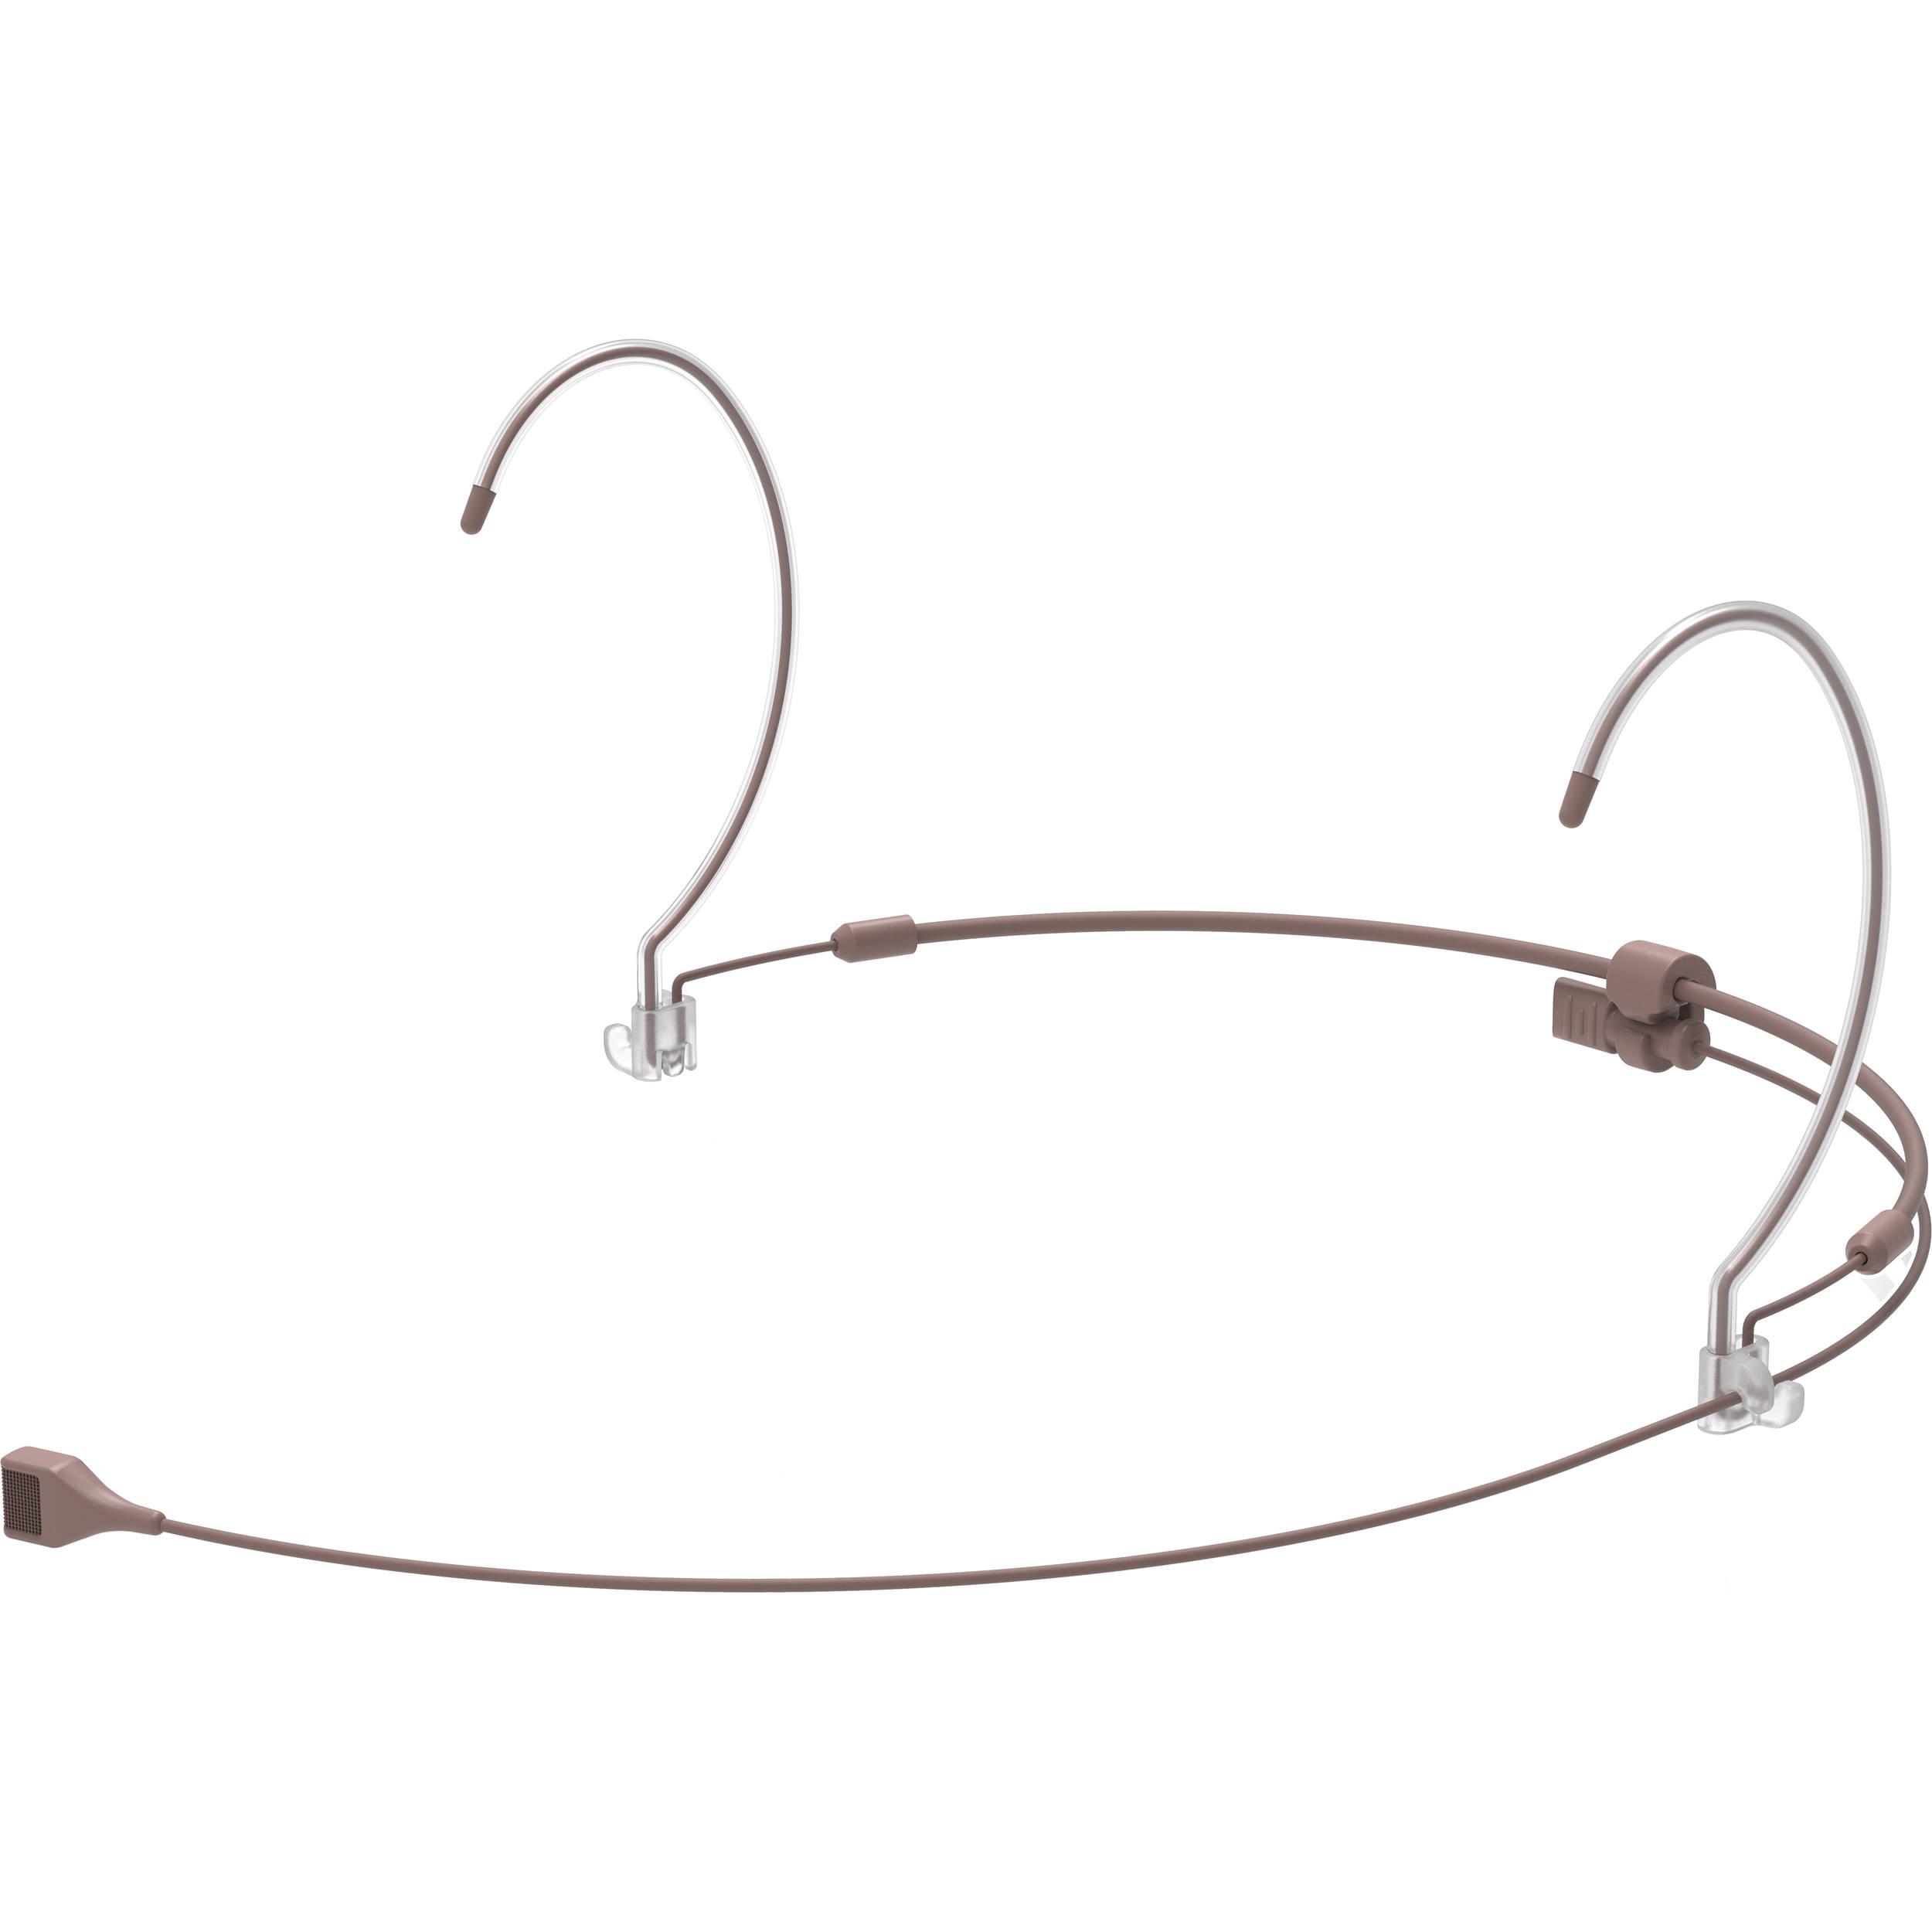 Countryman H7 Hypercardioid Headset Mic With Detachable H7cxlr